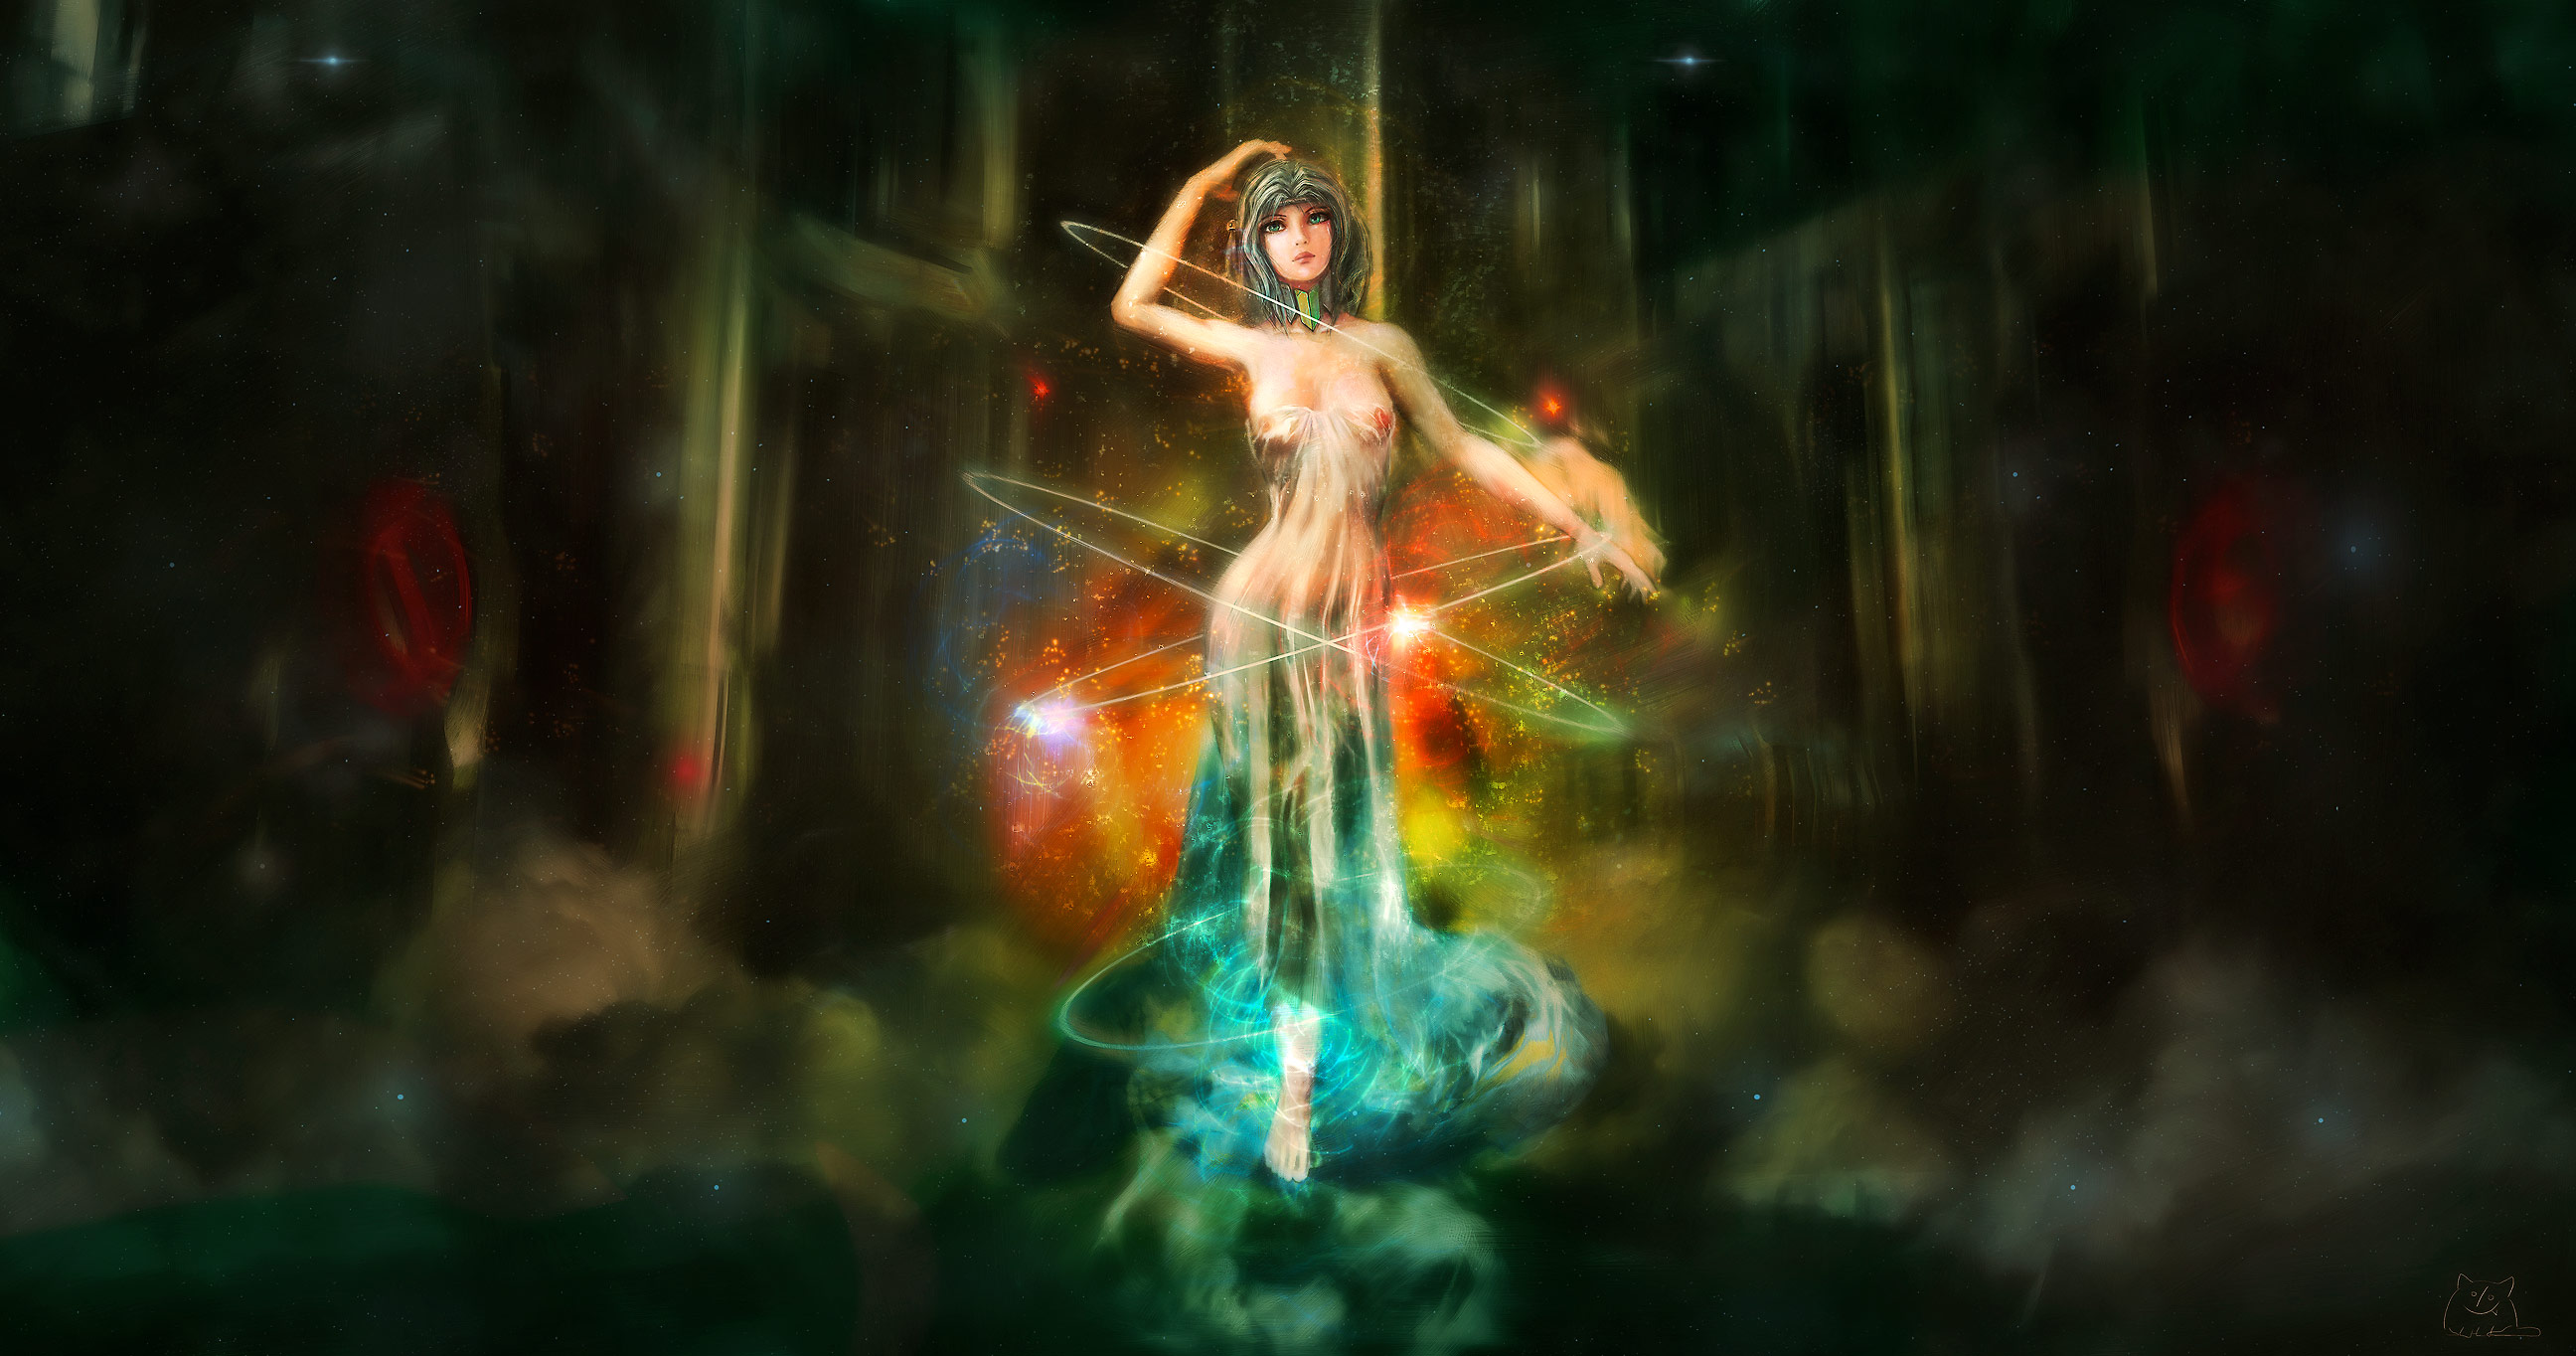 to_love-ru Fate stay night saber nude